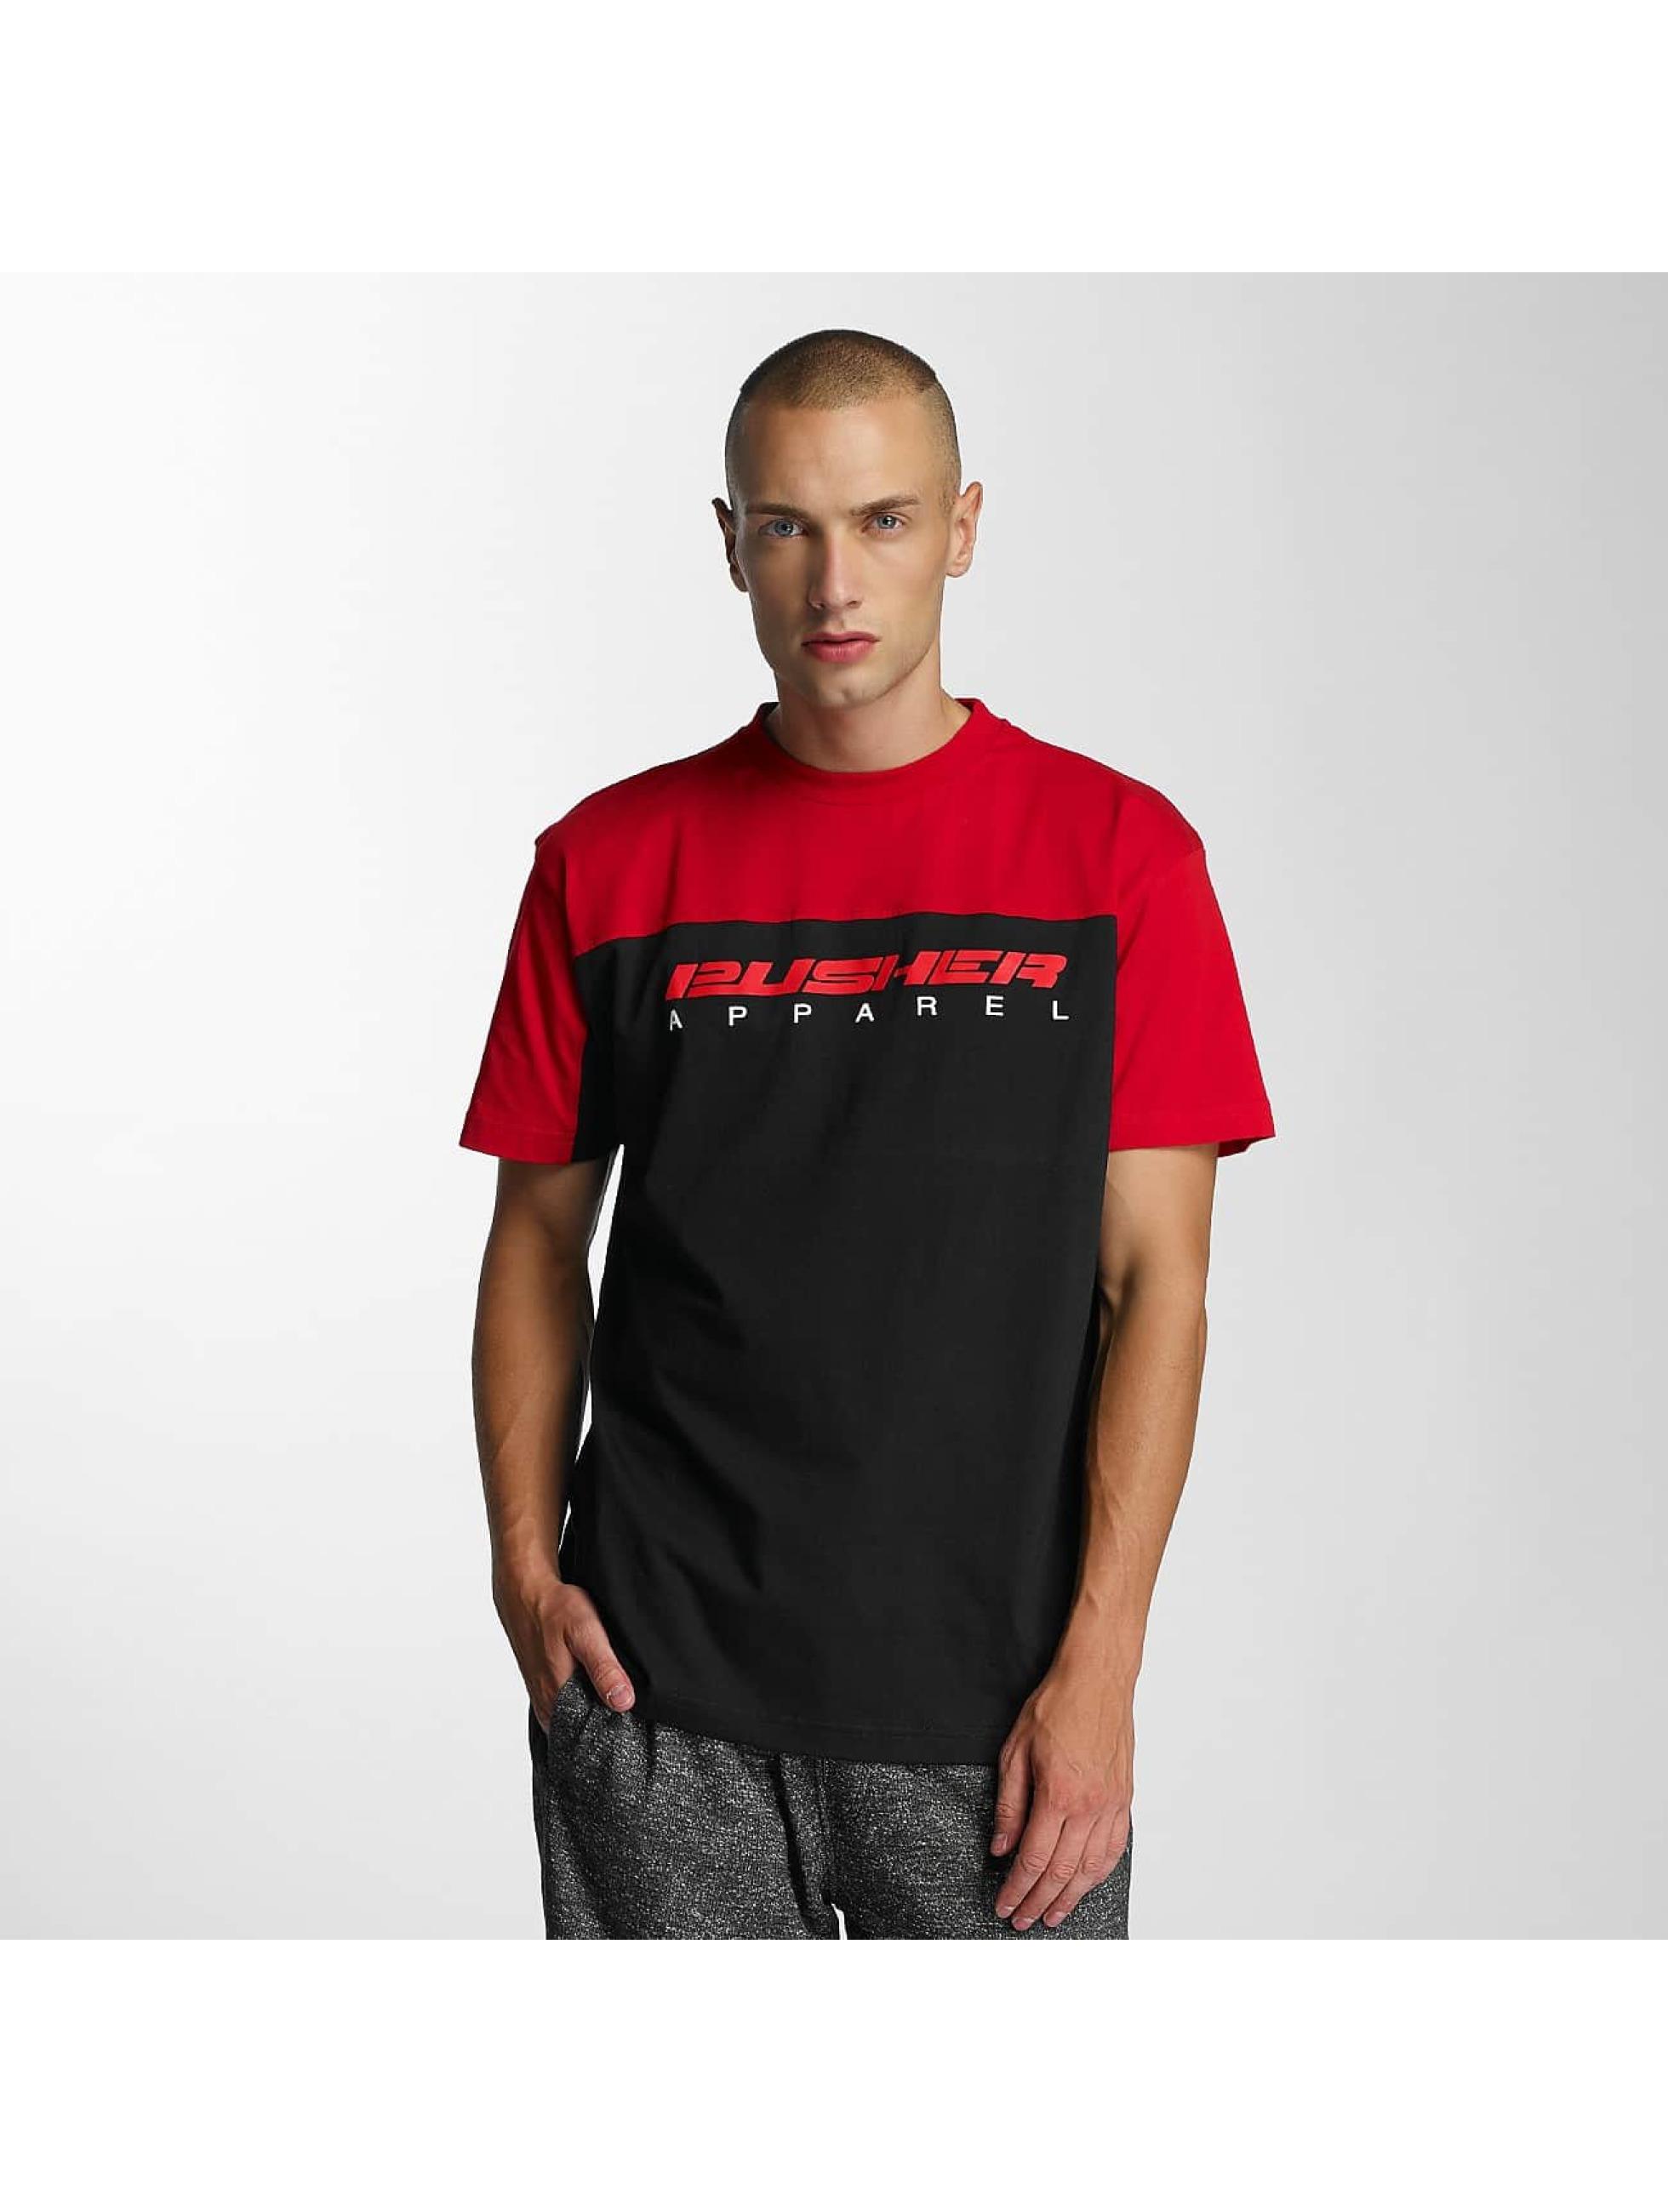 Pusher Apparel T-shirt Apparel 137 Riot nero